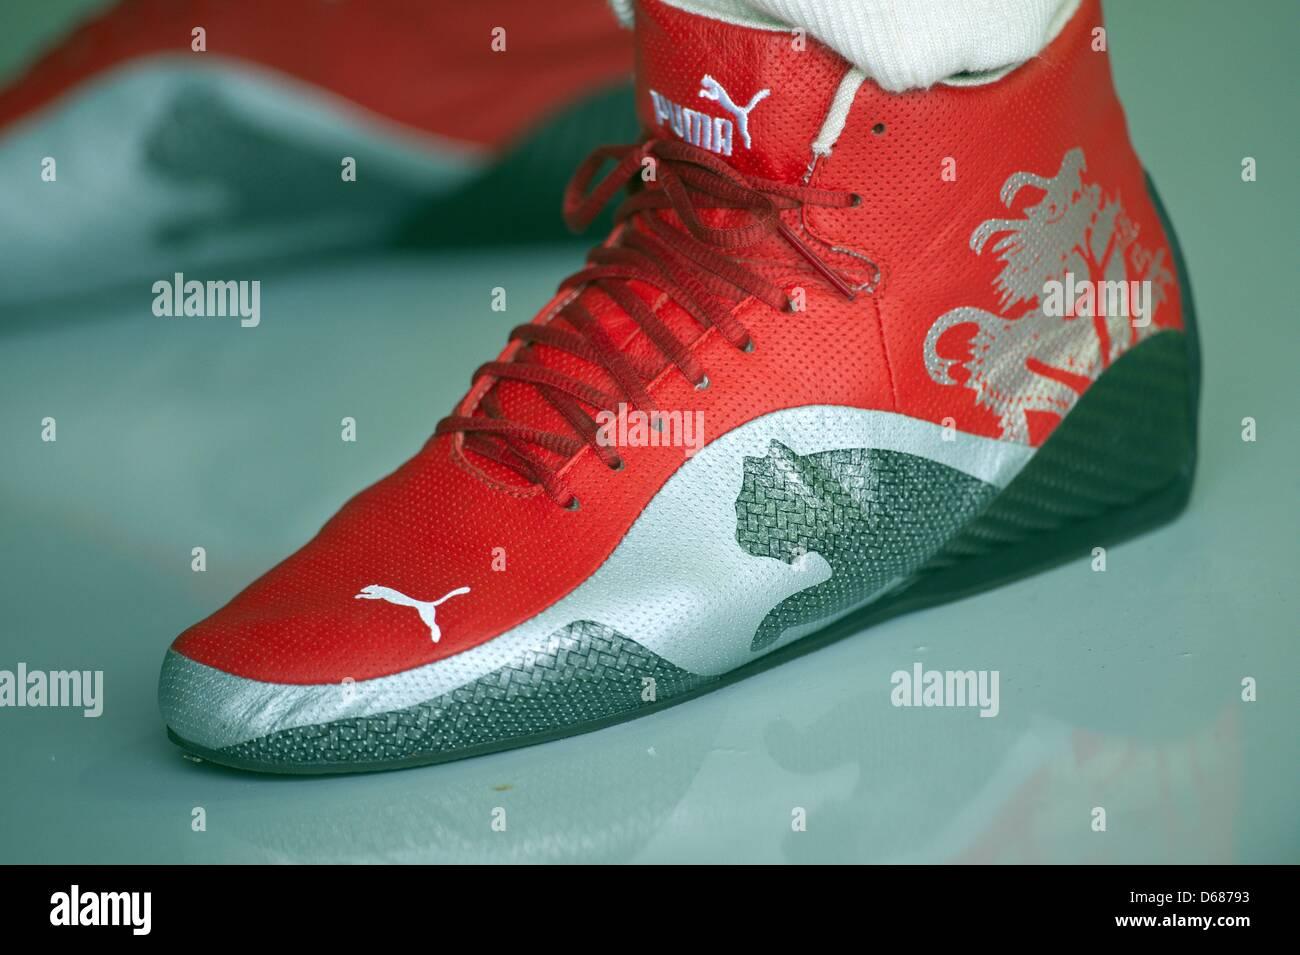 Shoes Alamy Bilder Shoes StockfotosRacing Racing 0wX8nPOk